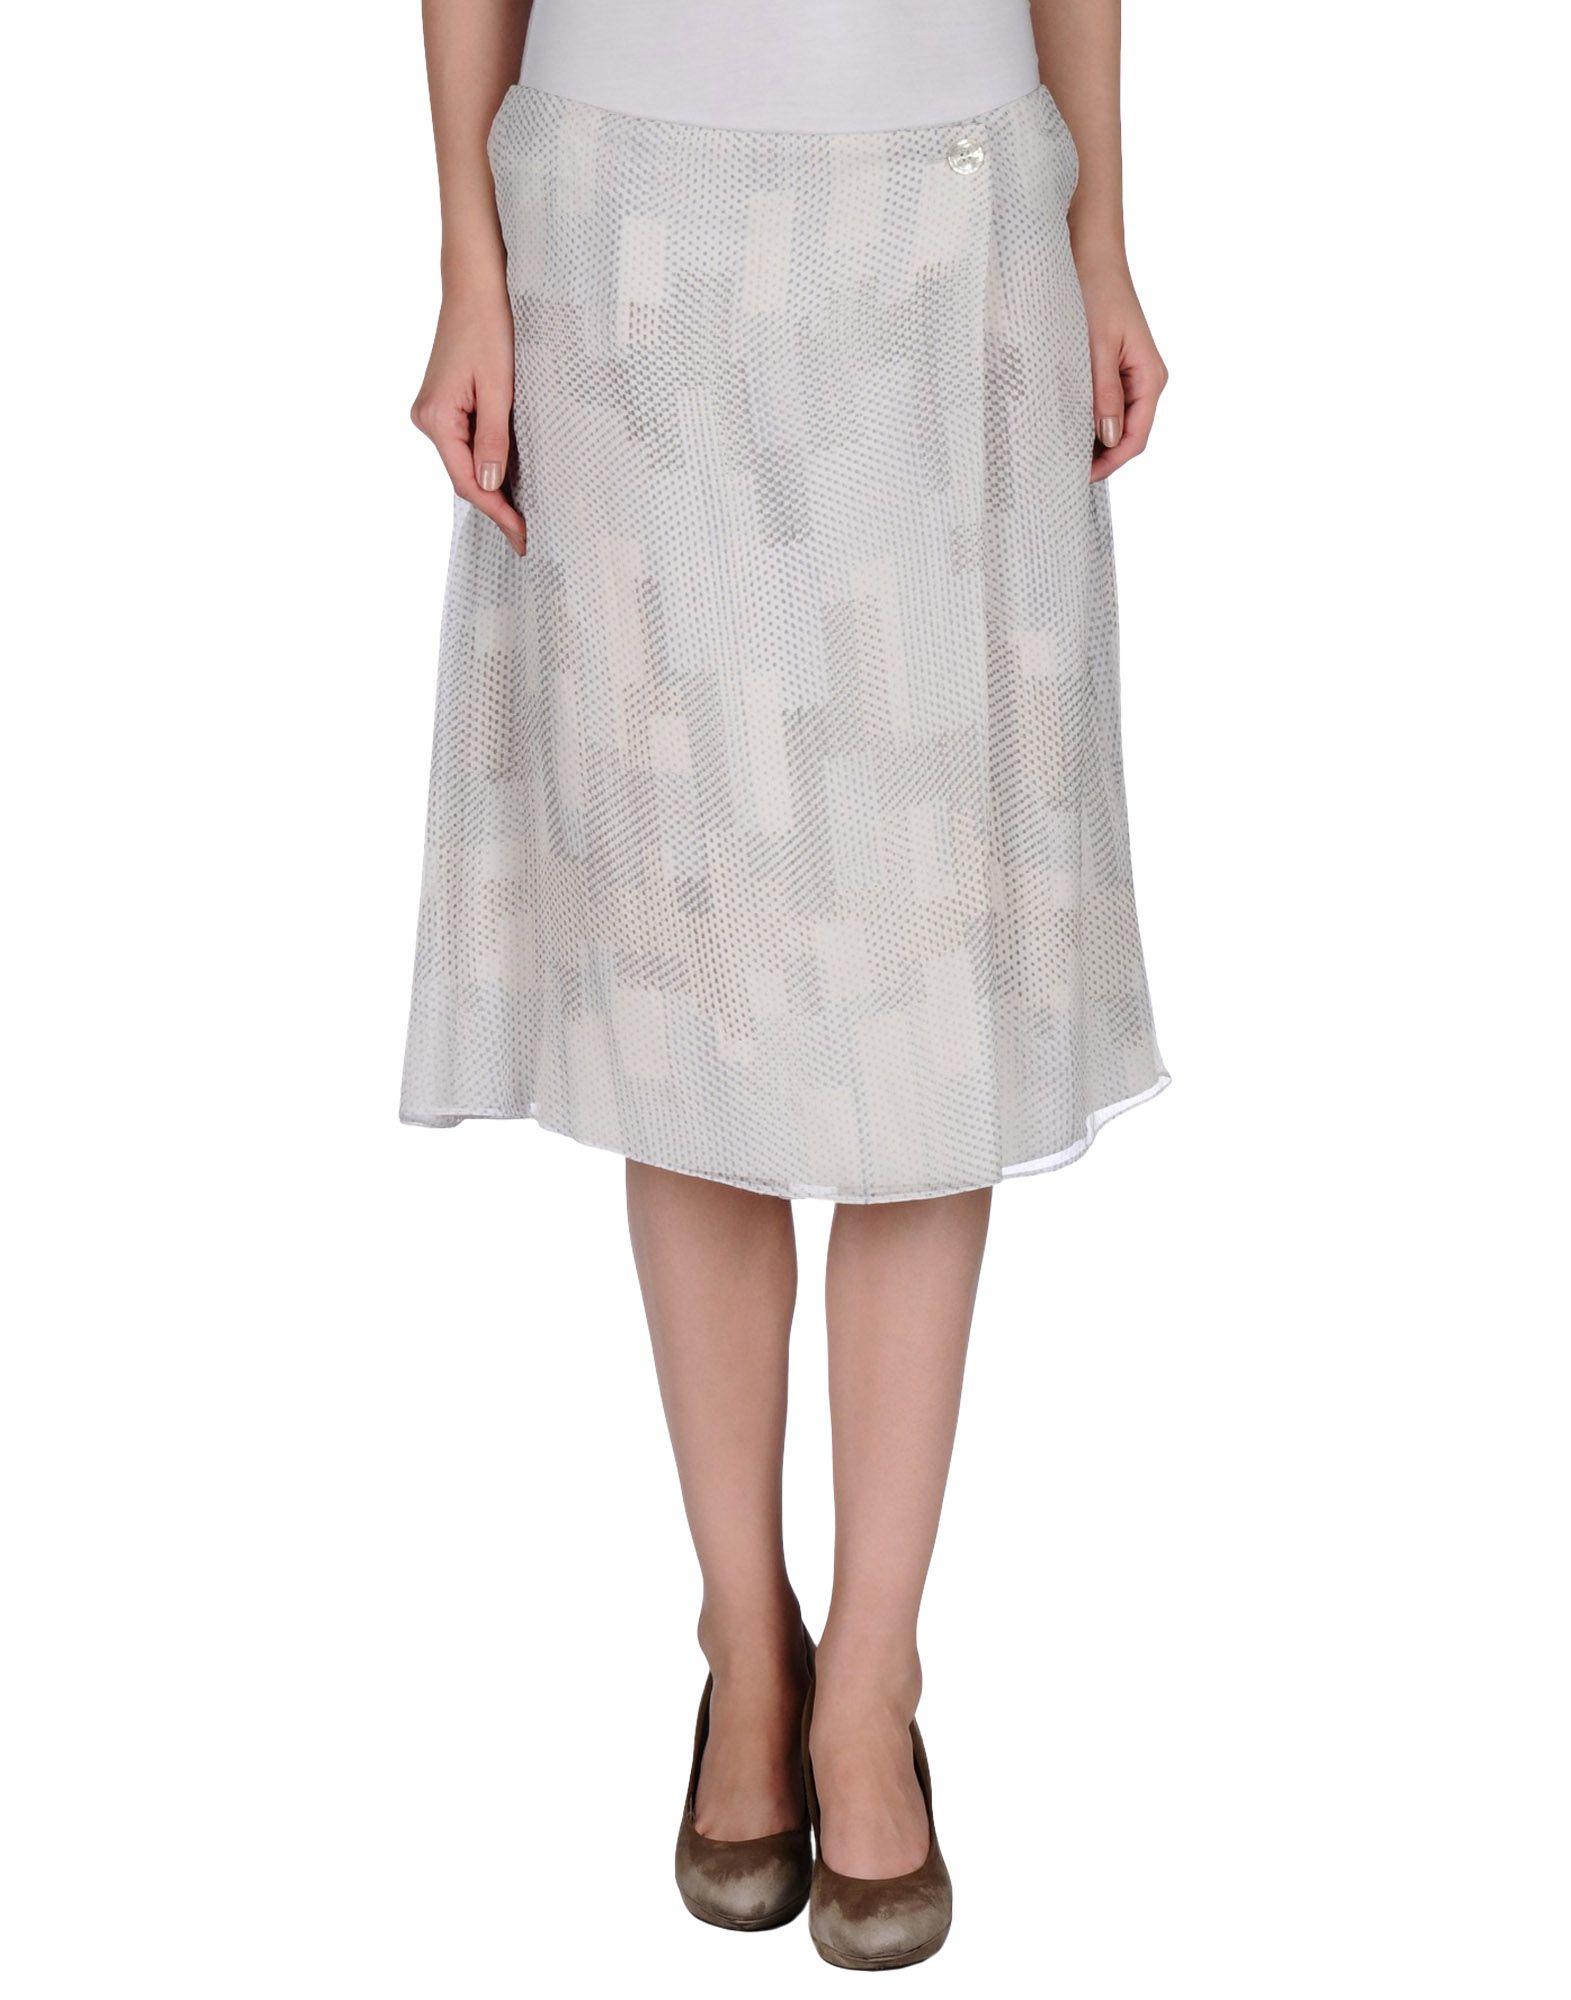 armani knee length skirt in gray lyst